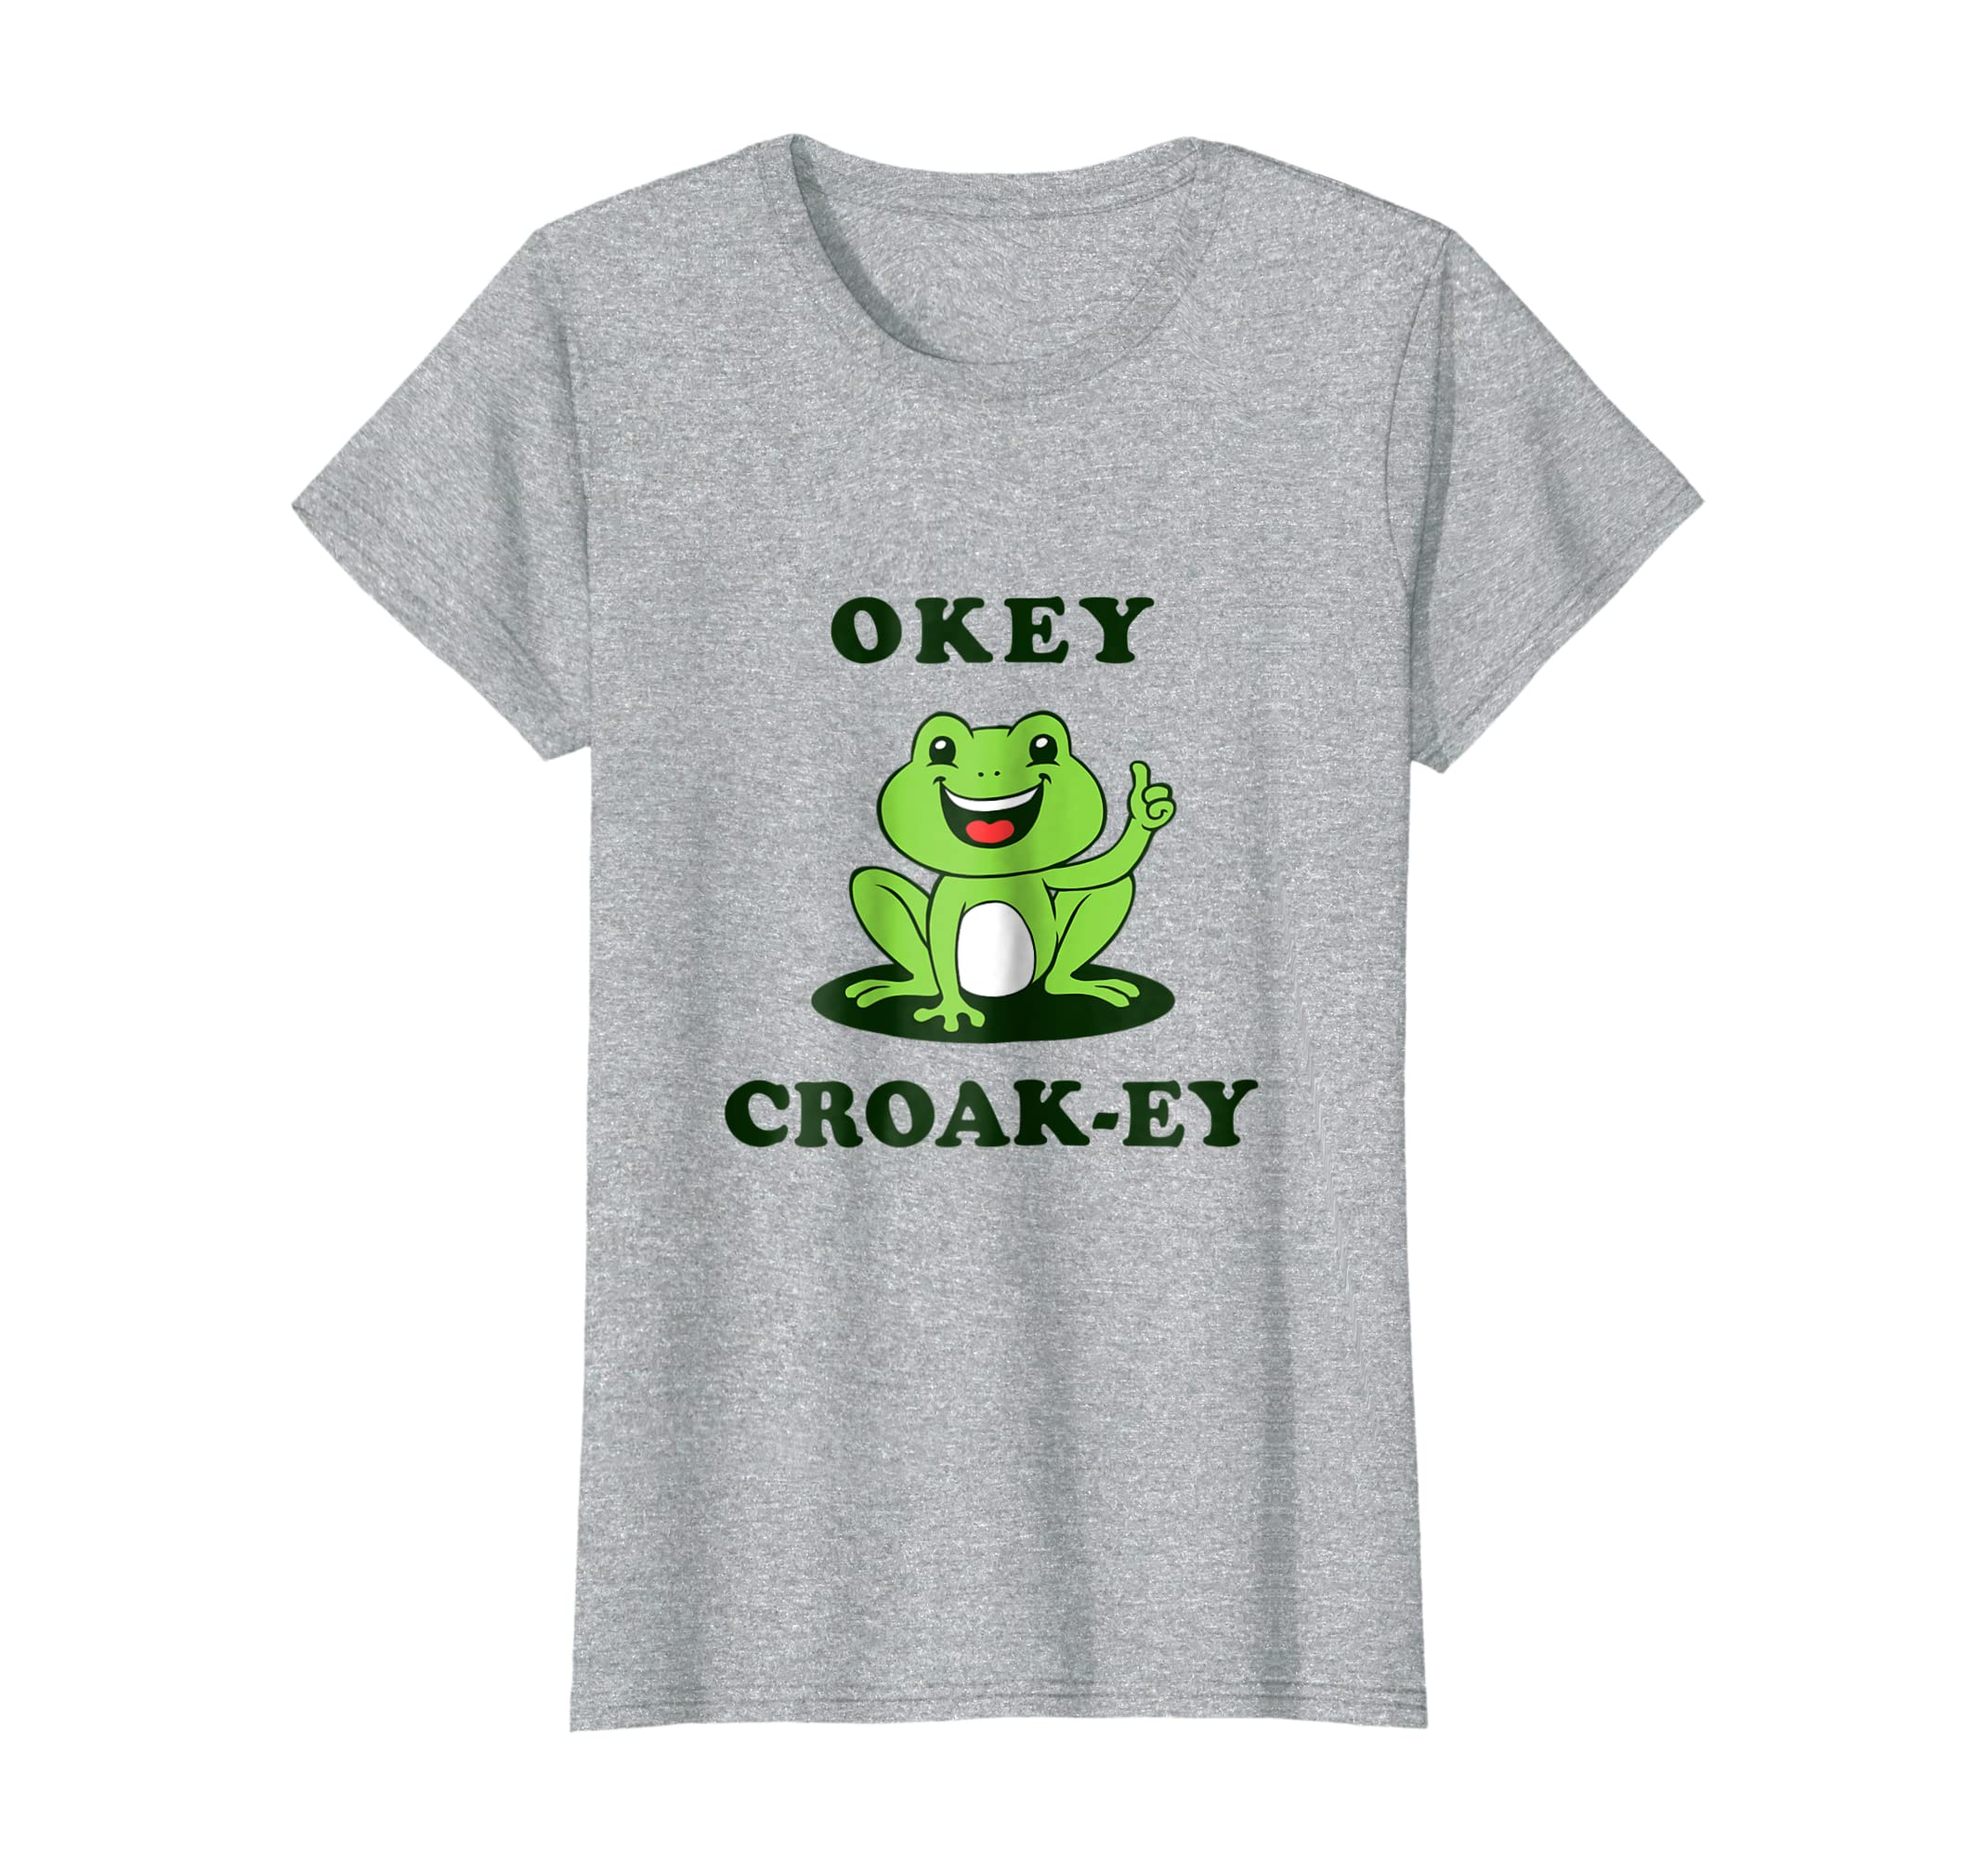 65da2921 Amazon.com: Okey Croak-ey T-Shirt - Funny Frog Toad Pun Joke: Clothing